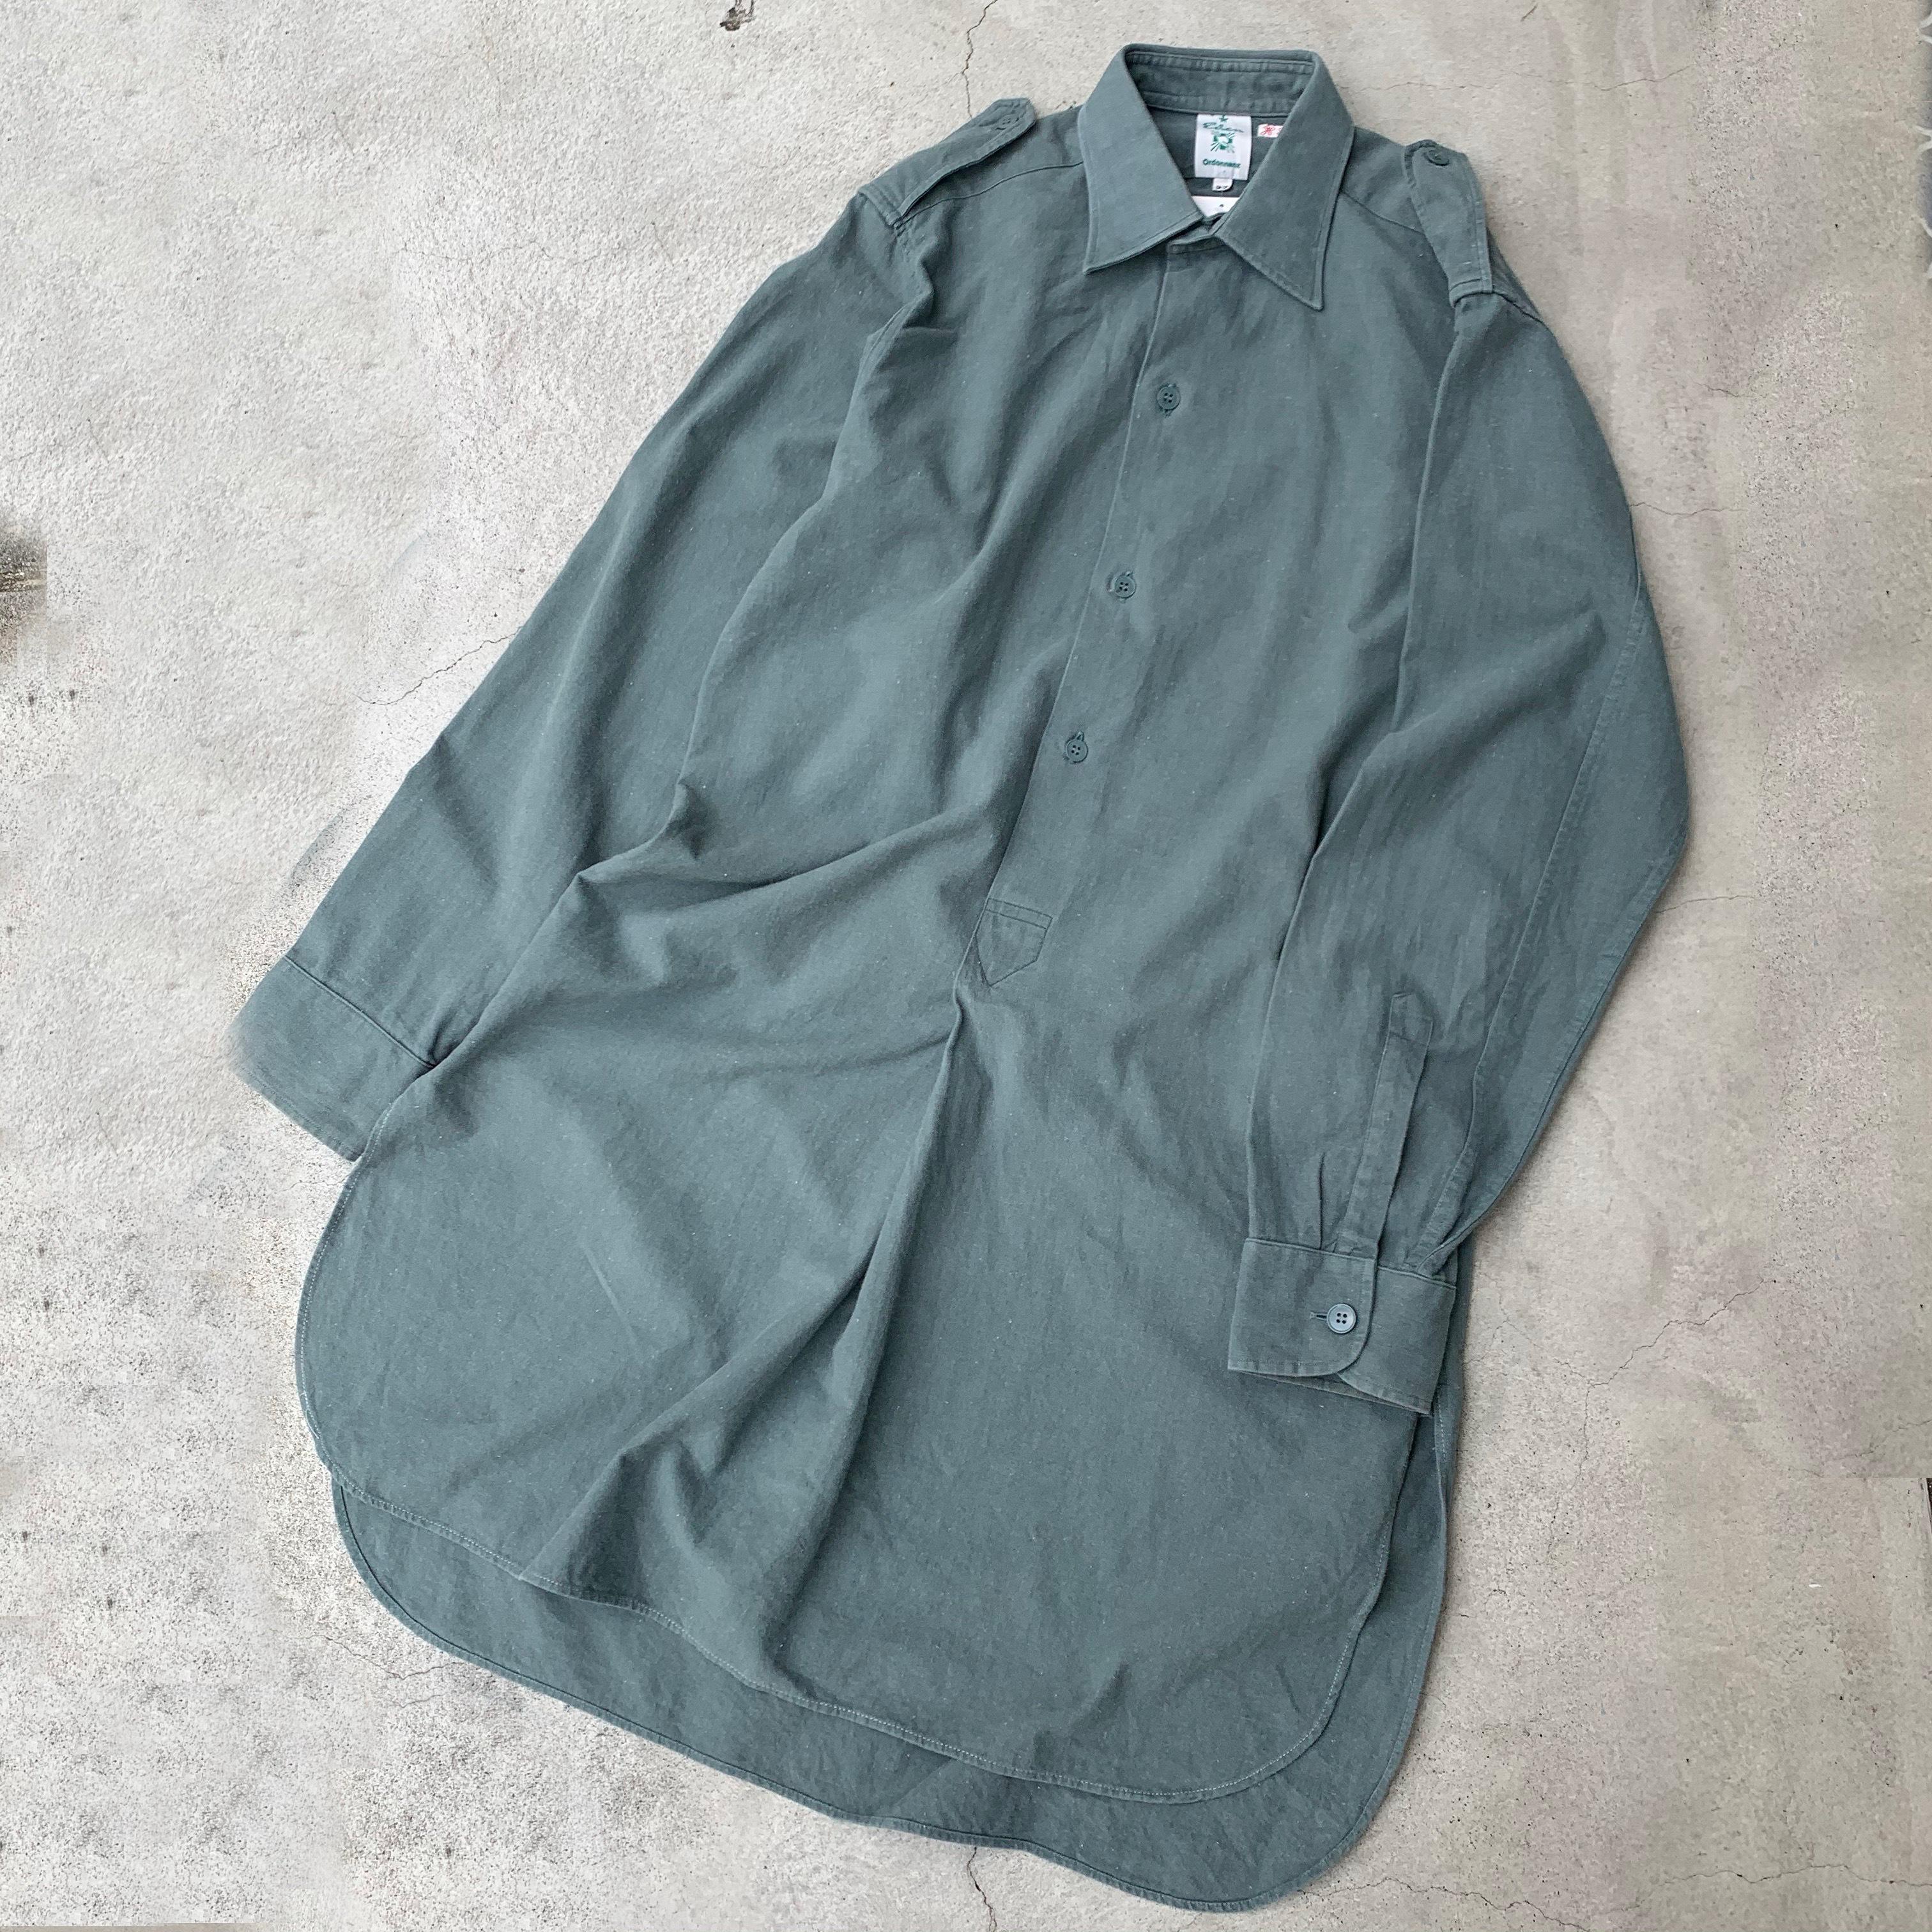 vintage military shirt